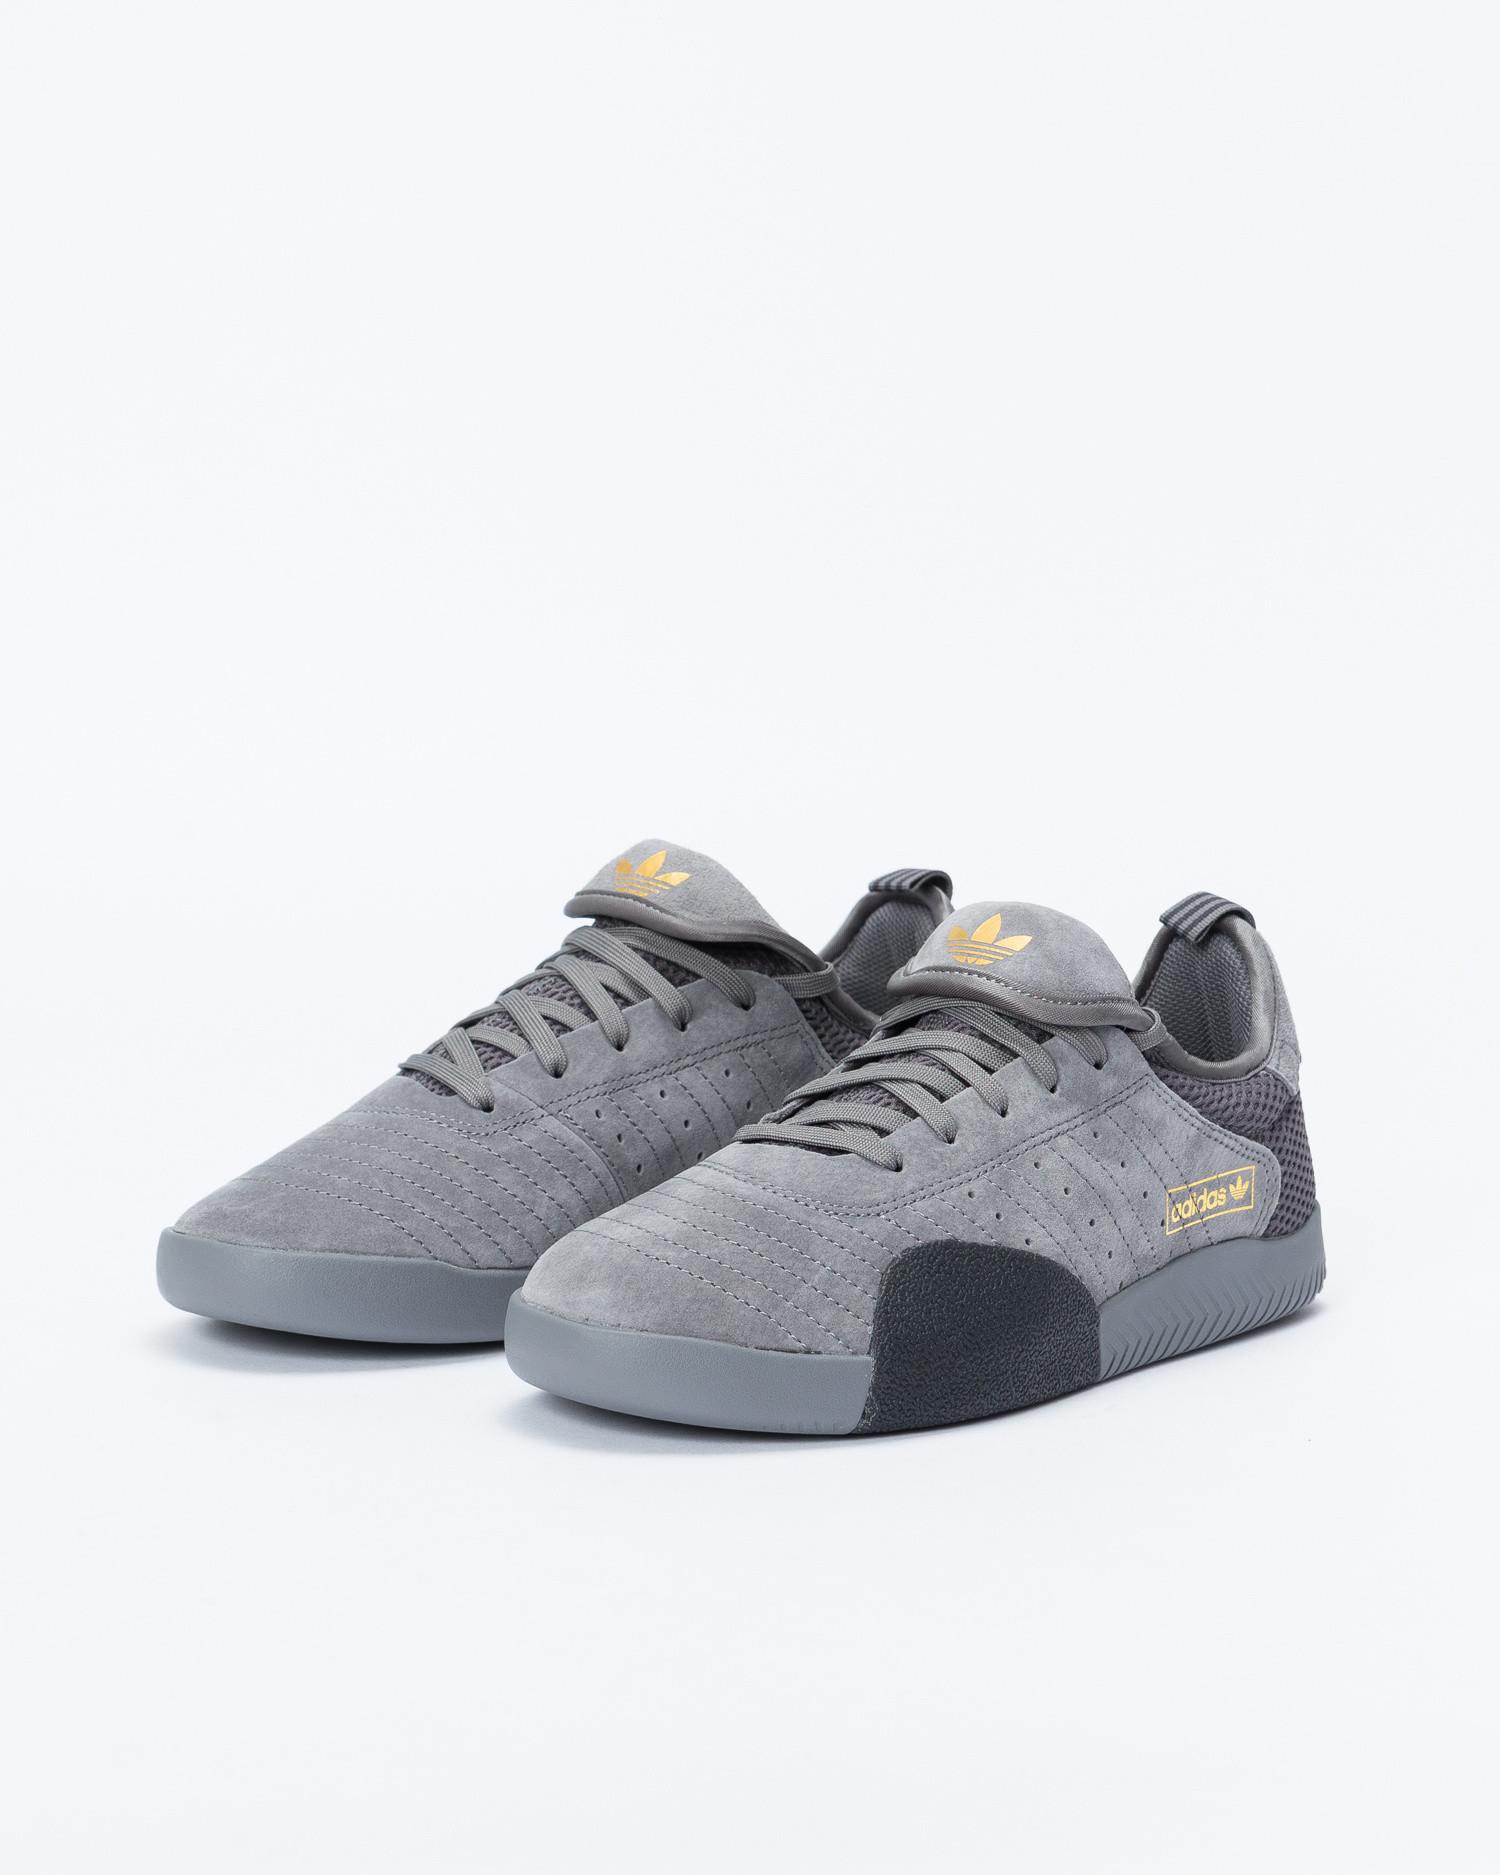 adidas 3ST.003 Shoes Grey Four Carbon Gold Metallic